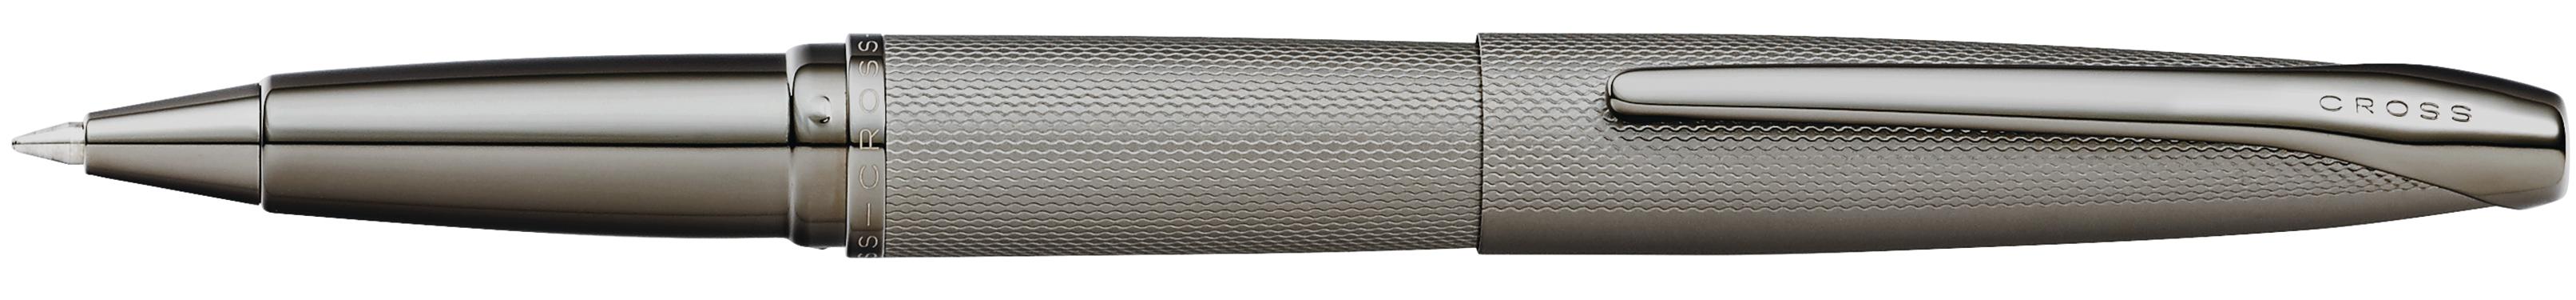 ATX Sandblasted Titanium Gray Rollerball Pen